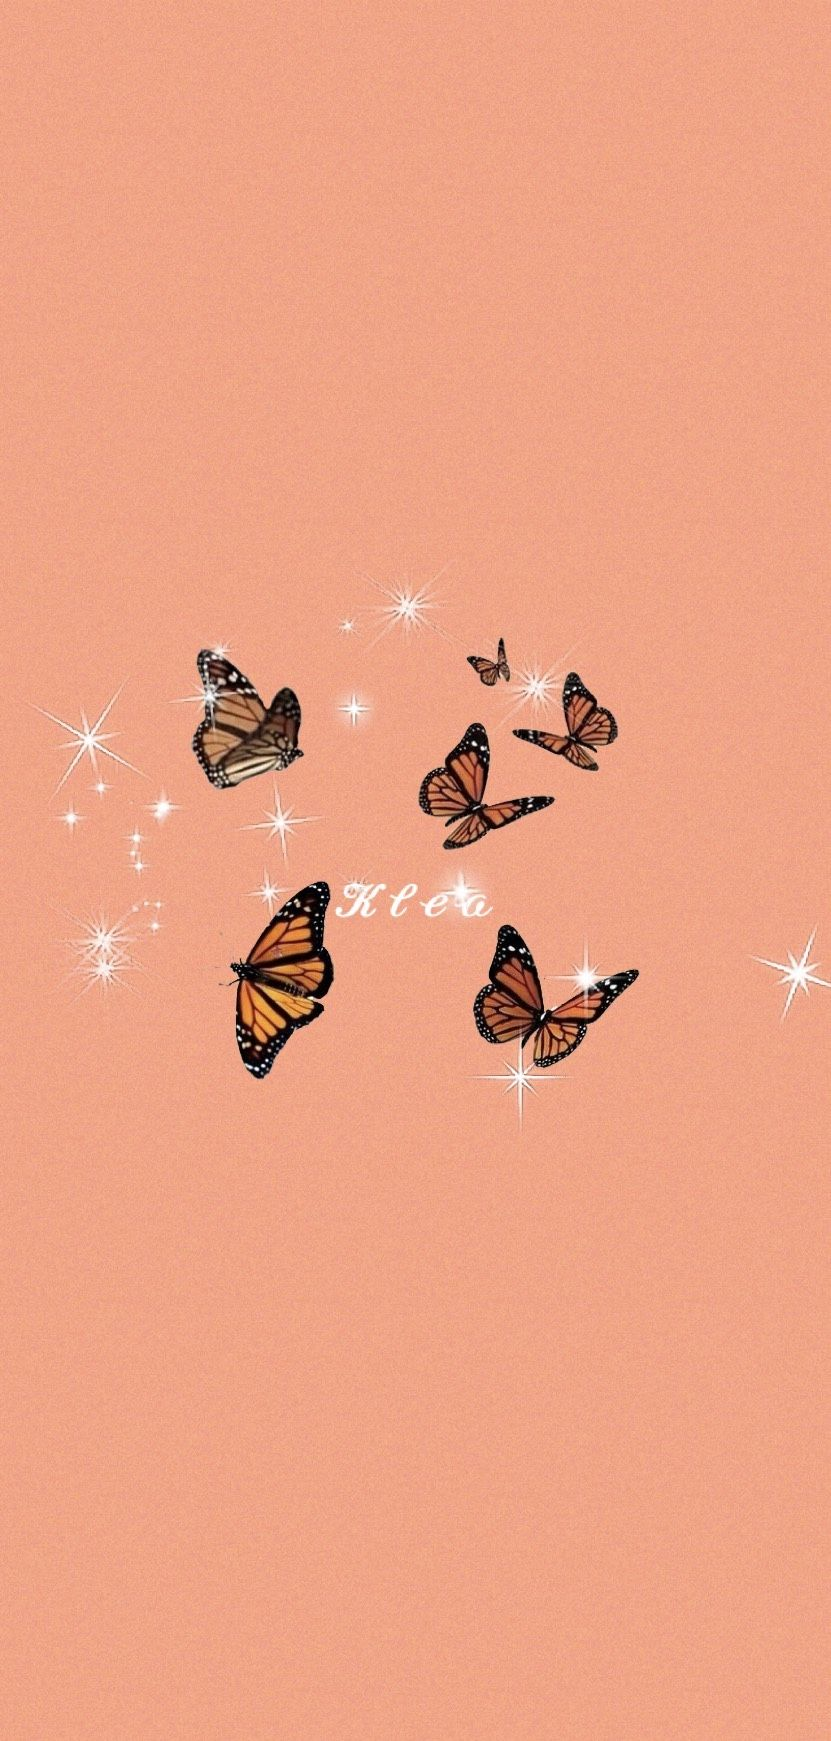 Butterfly Wallpaper Iphone Pink Wallpaper Cartoon Aesthetic Iphone Wallpaper